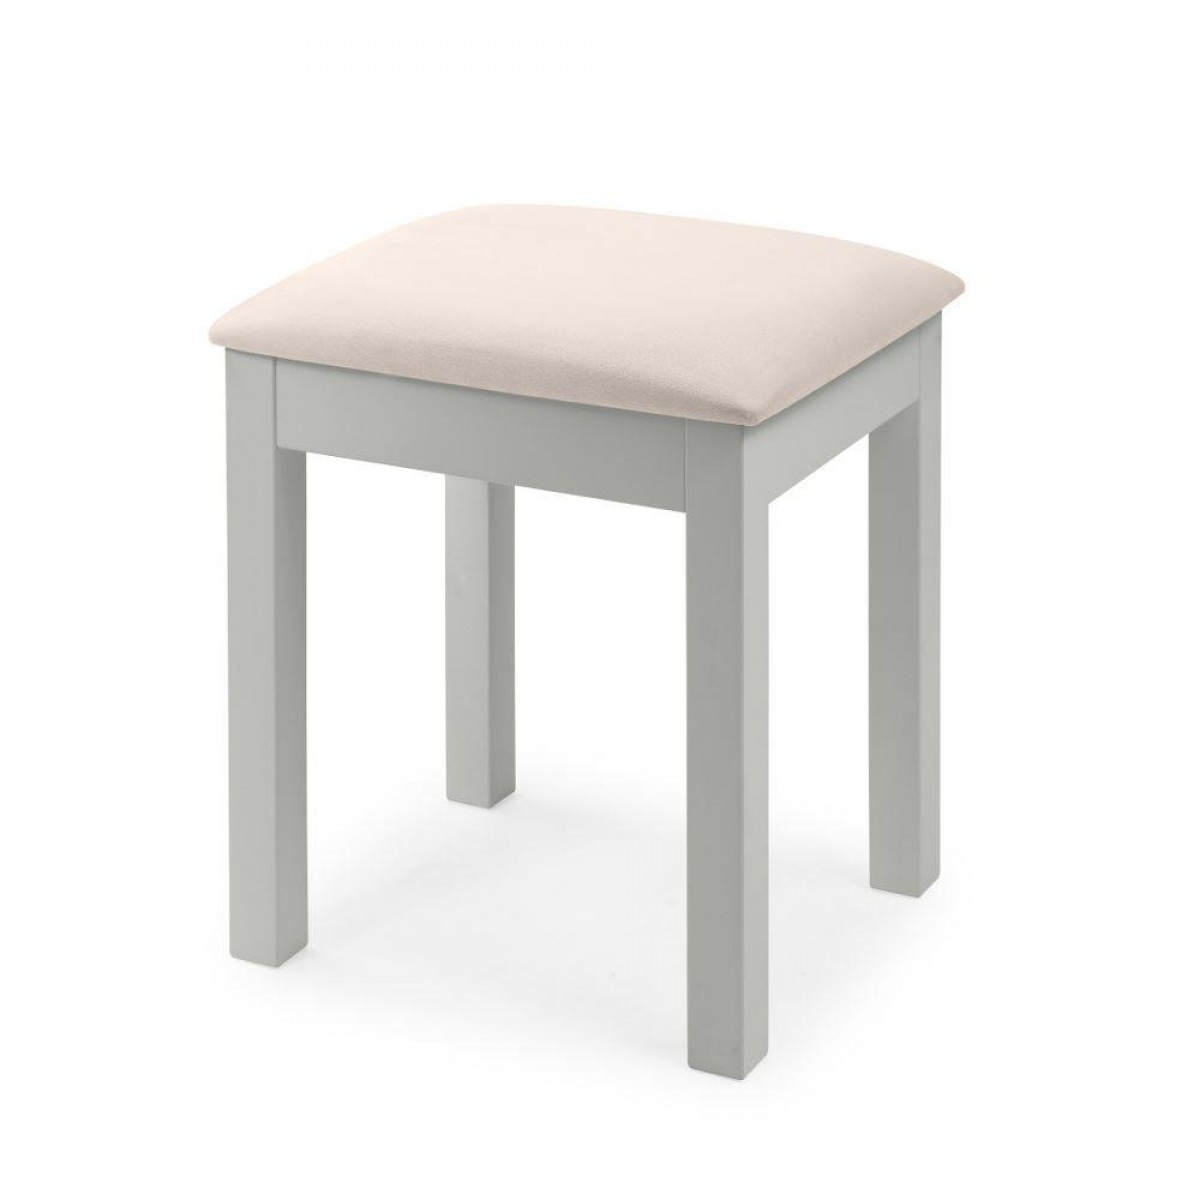 Maine Dove Grey Dressing Table Stool